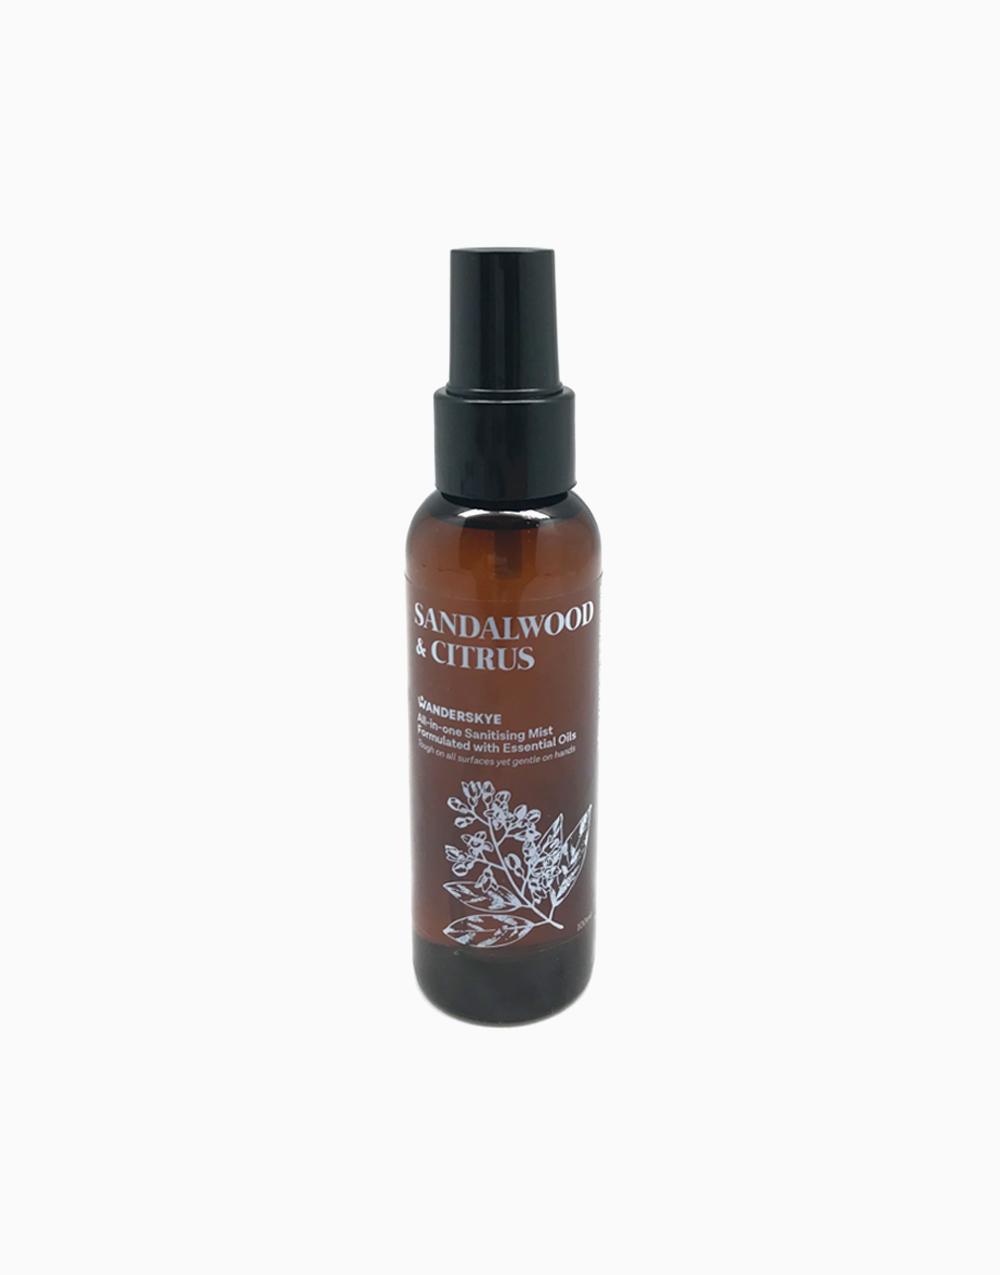 All-In-One Sanitizing Mist by Wanderskye   Sandalwood & Citrus